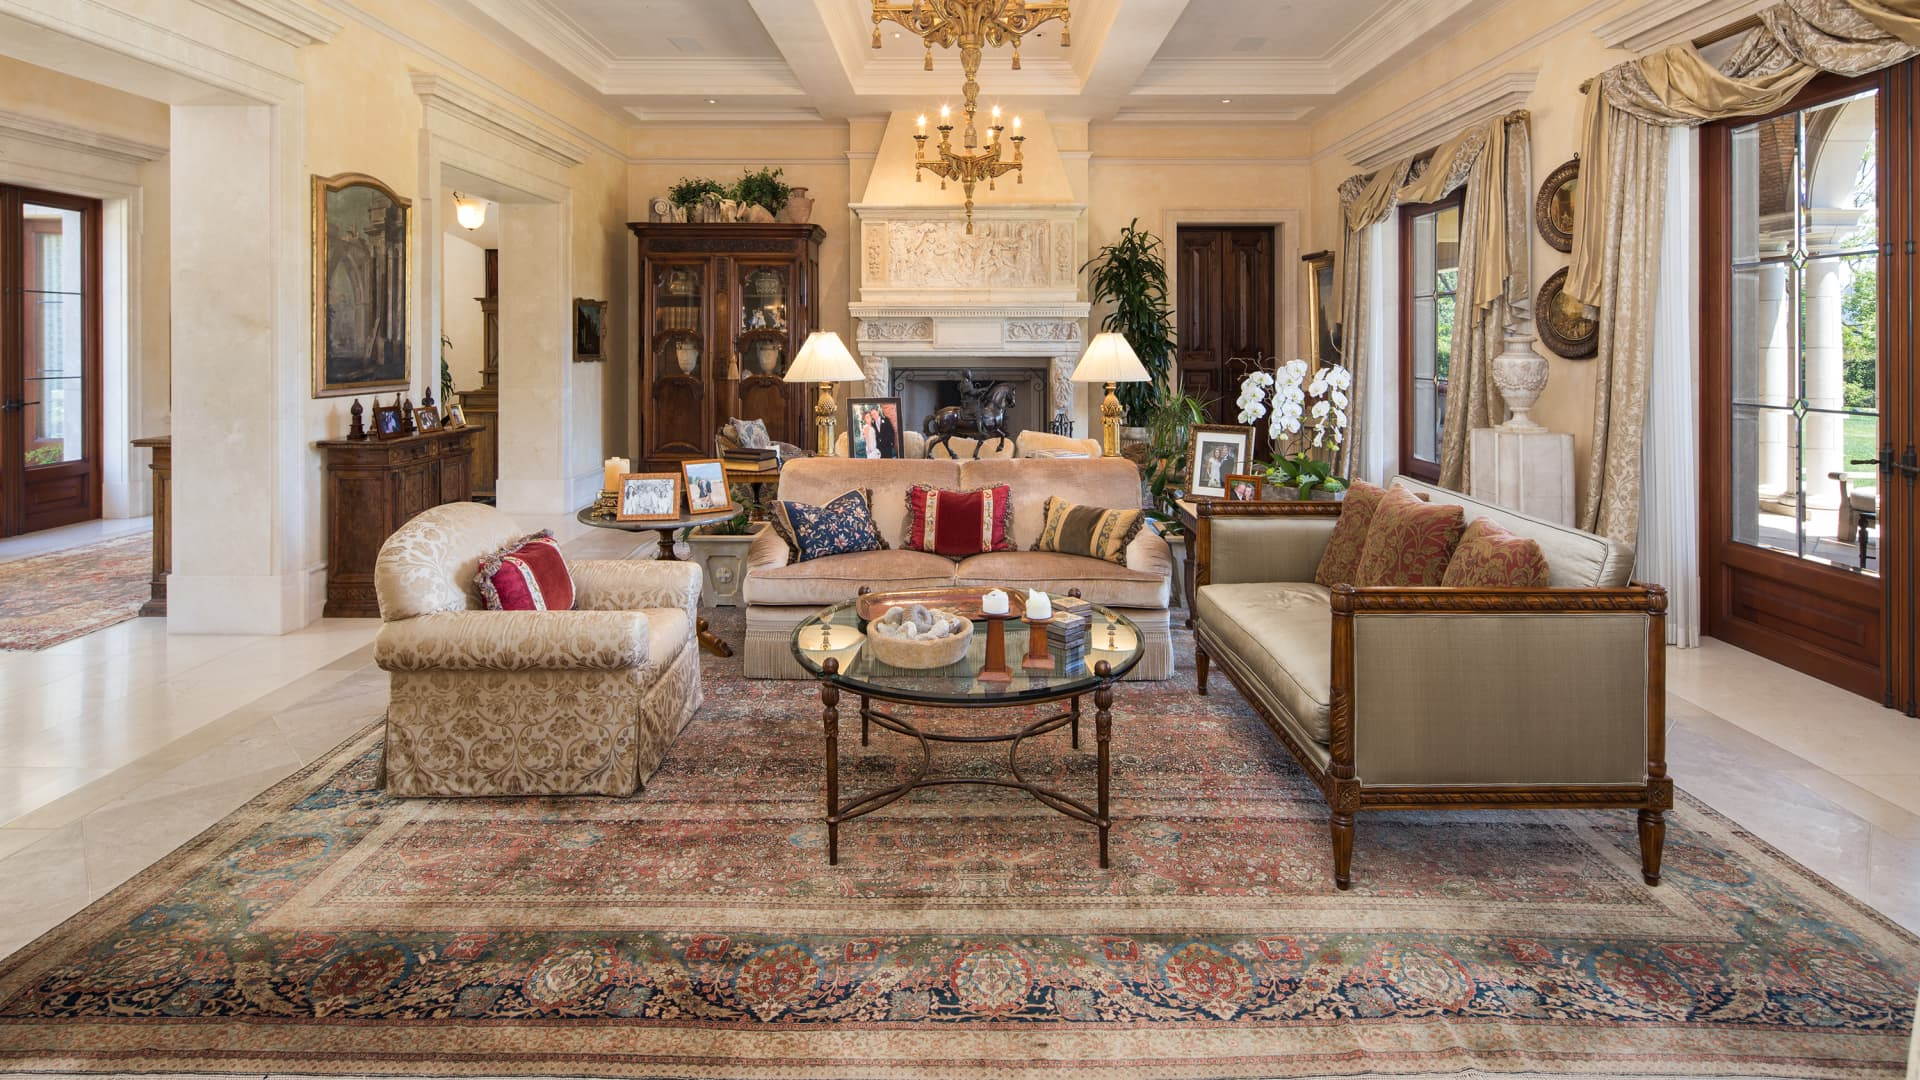 A spacious living area inside Villa Firenze